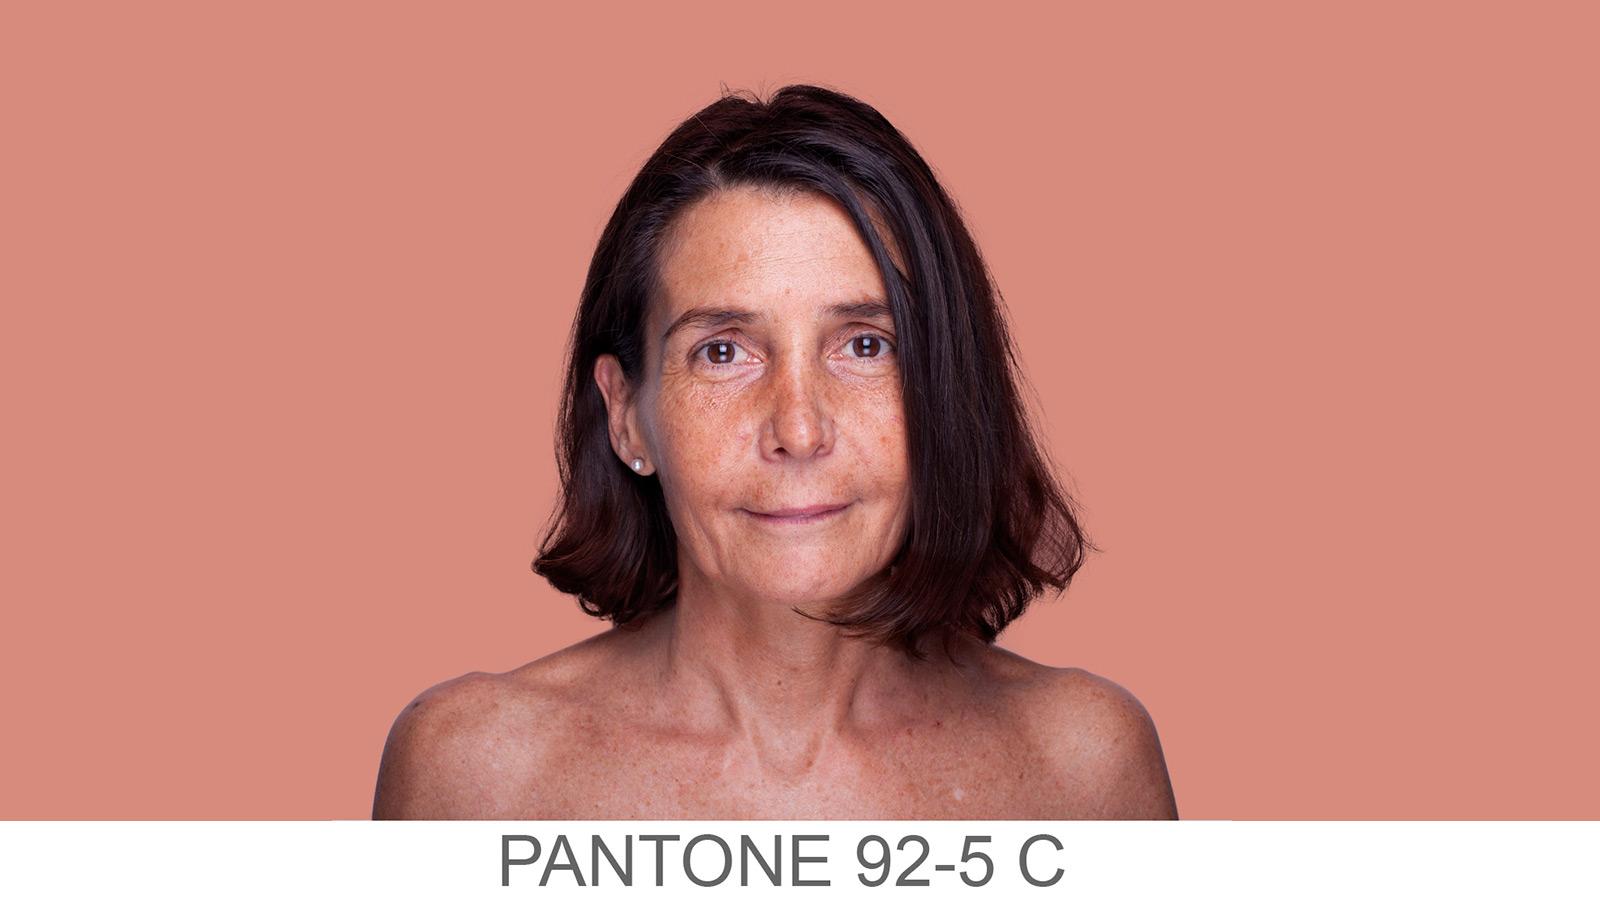 angelica-dass-humanae-pantone-series-5-woman